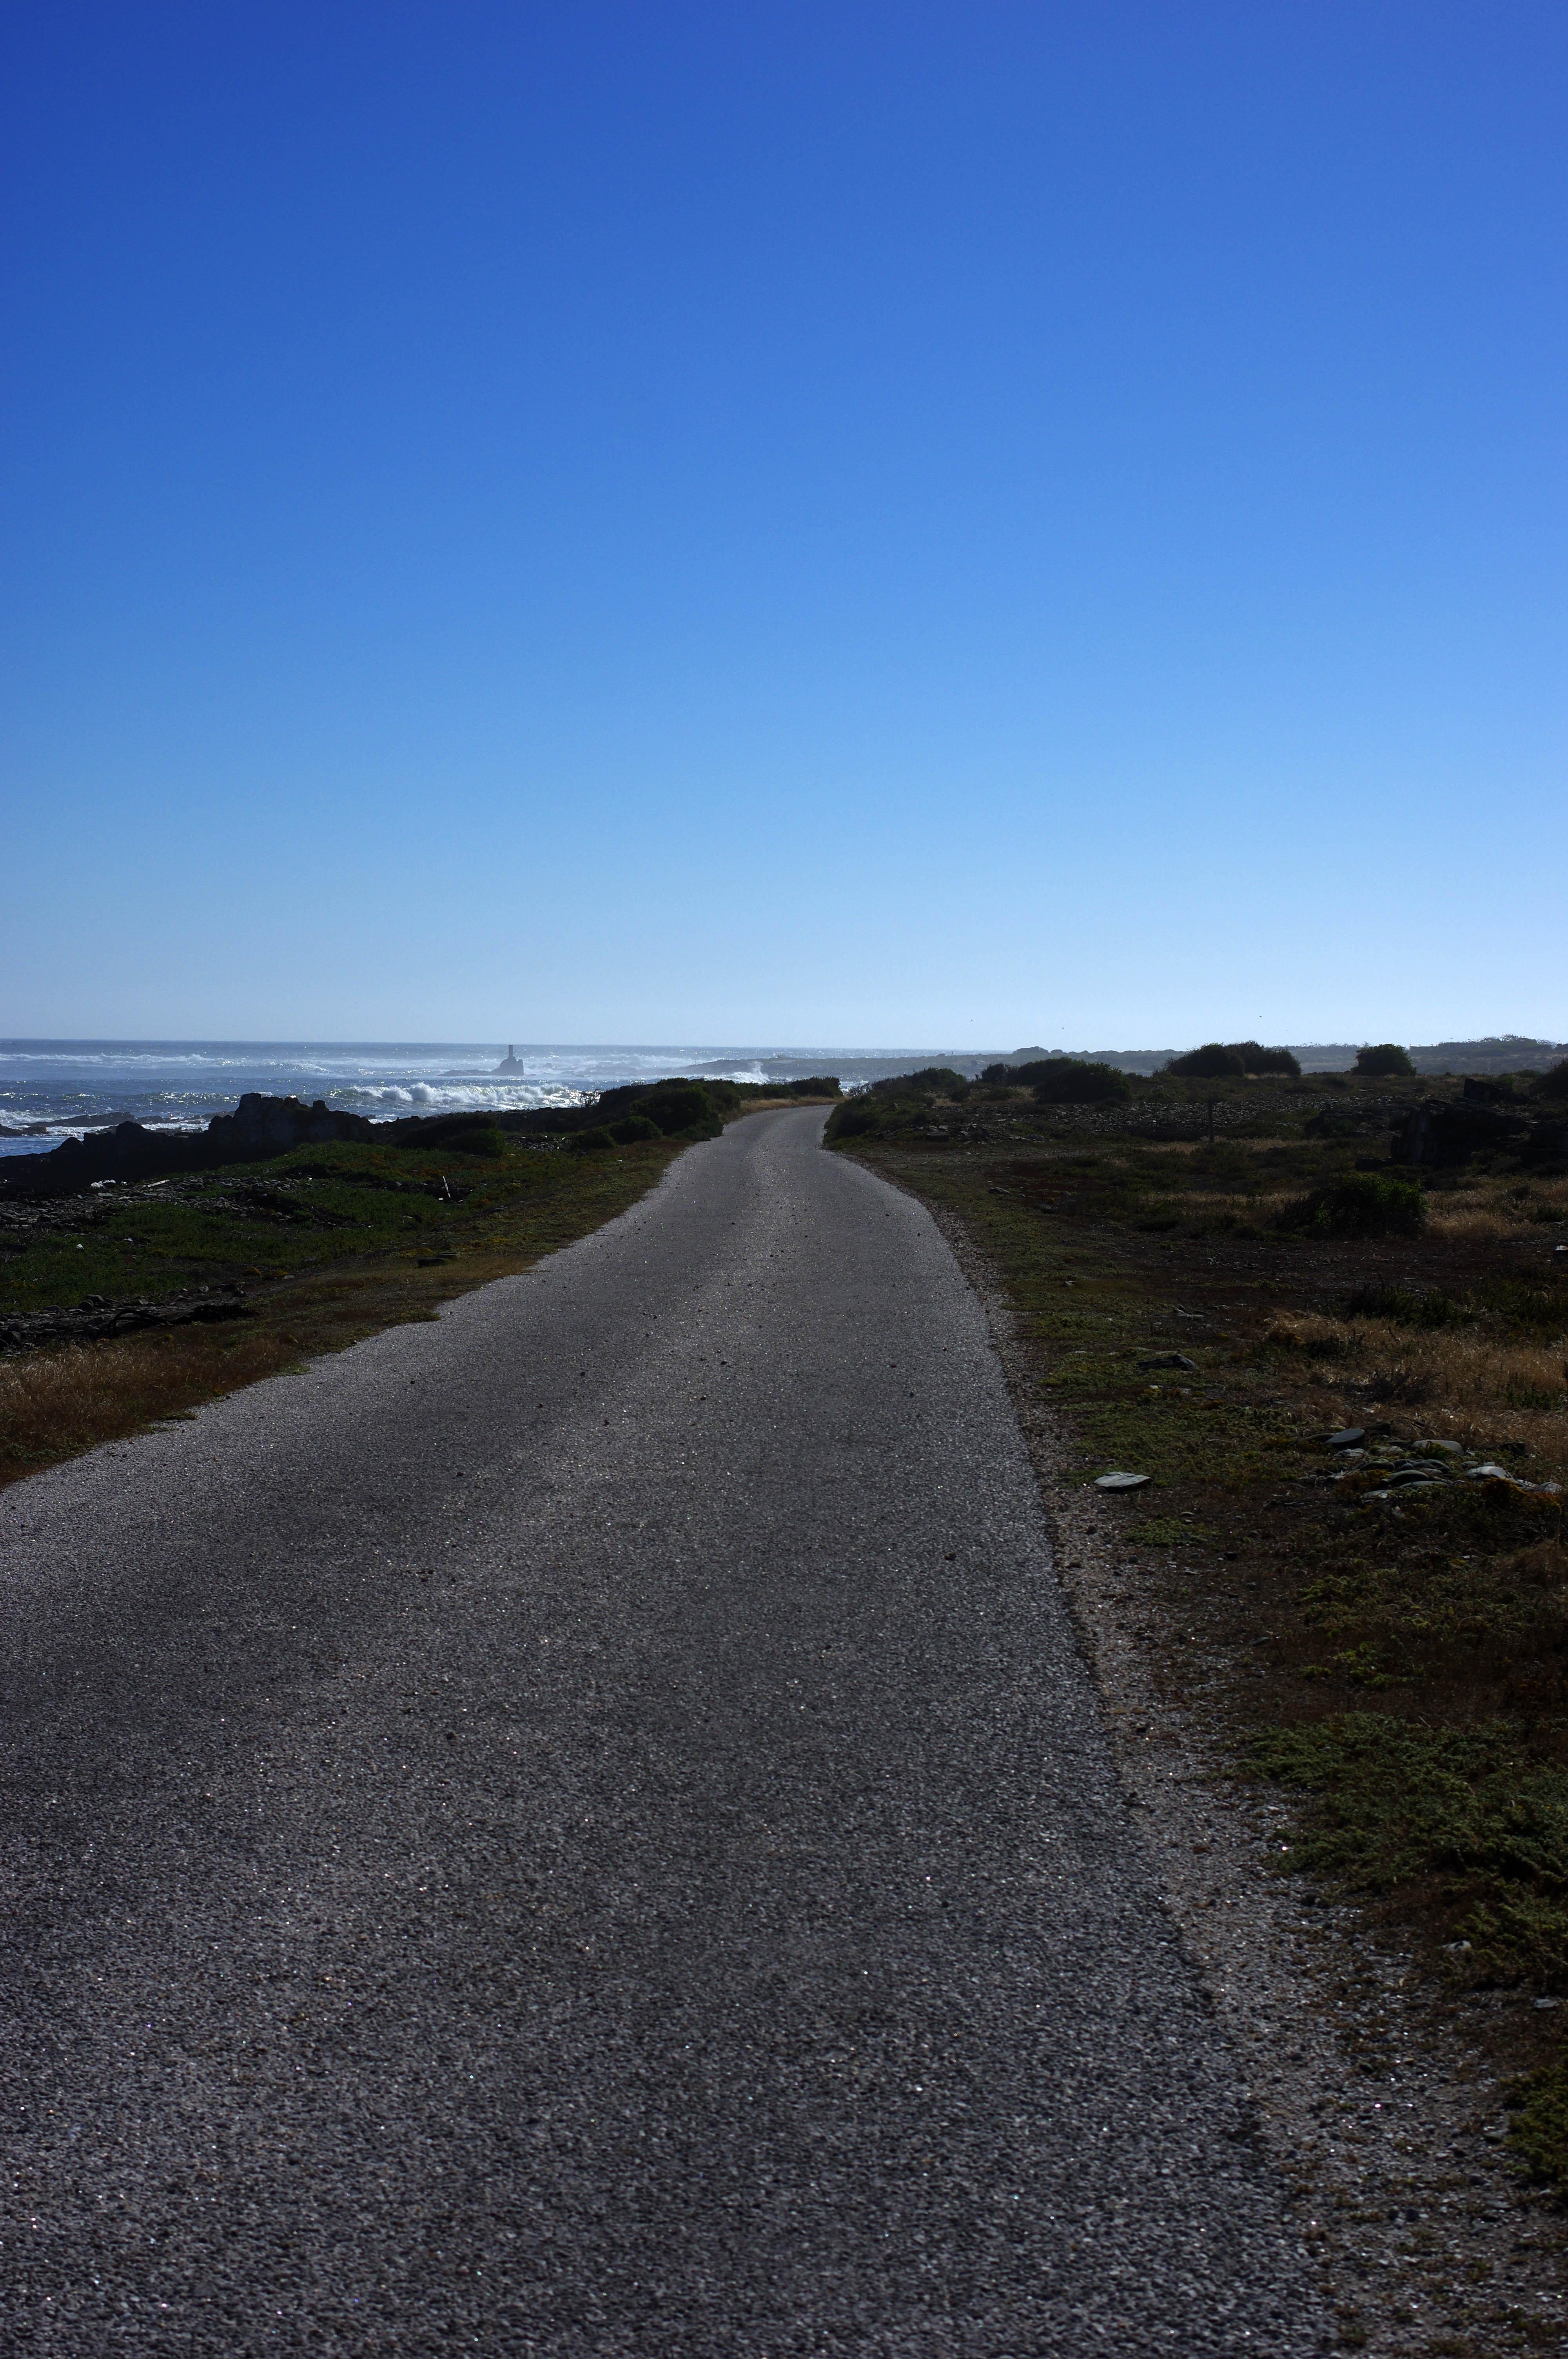 171122_CT_Robben island3